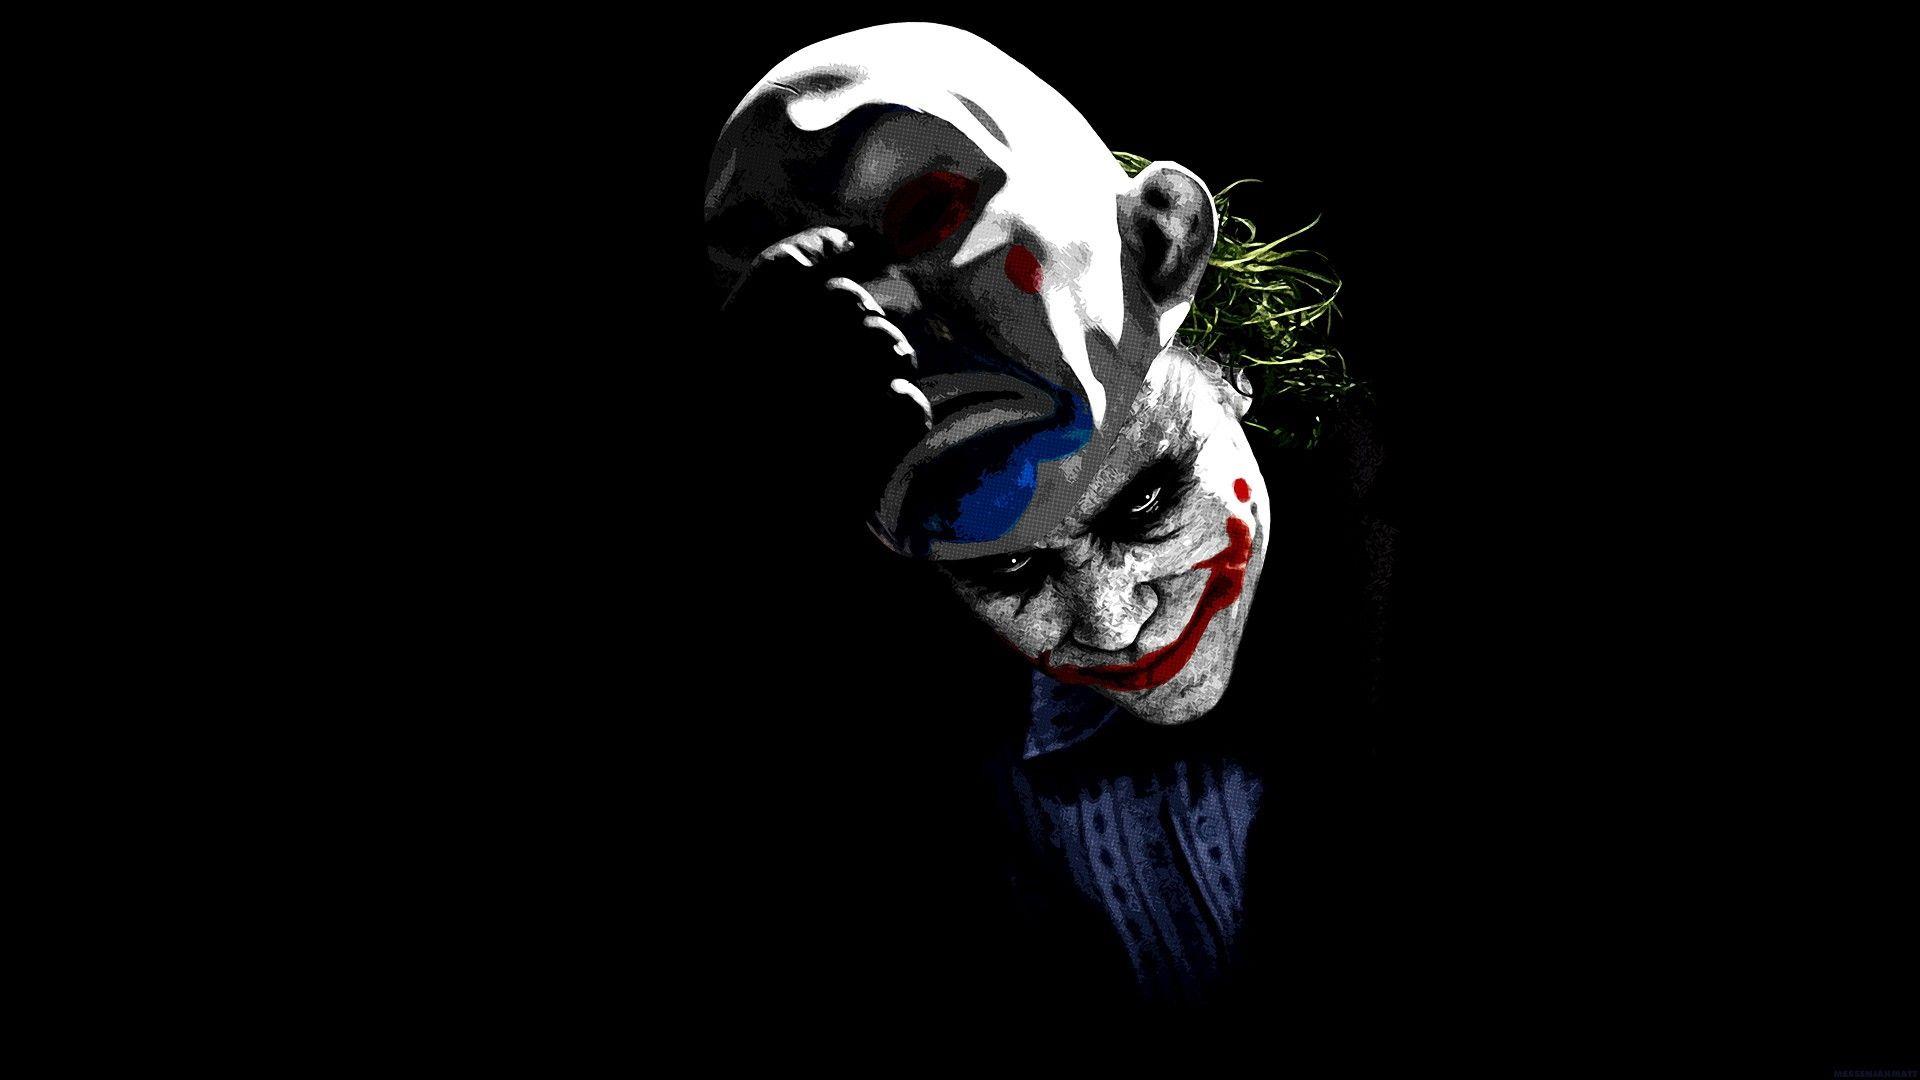 Killer Clown Wallpapers Group 50